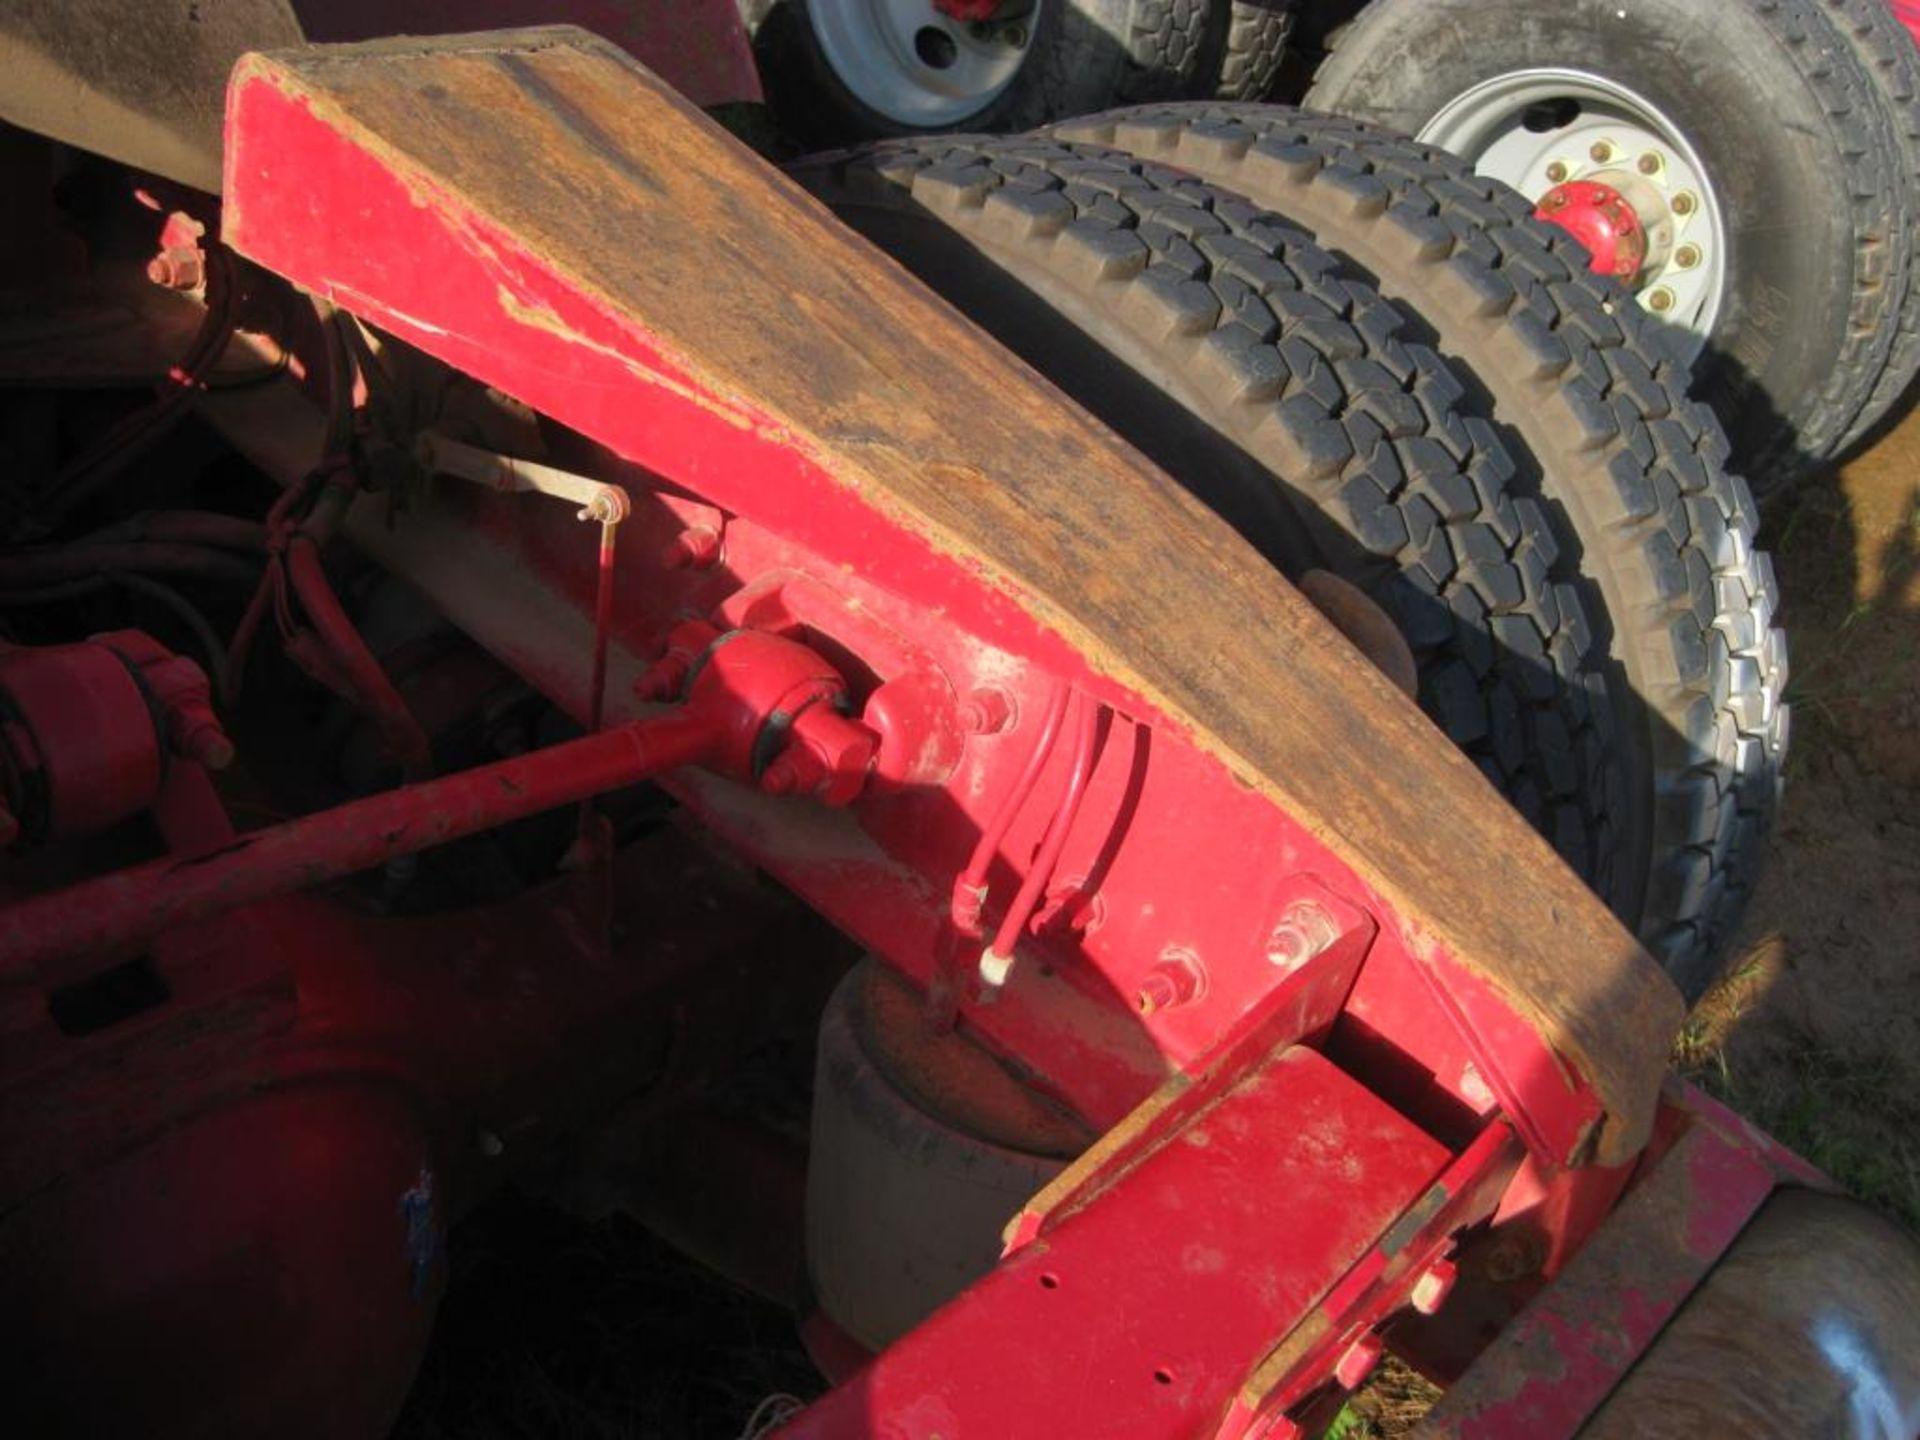 Kenworth Winch Truck - Image 6 of 22